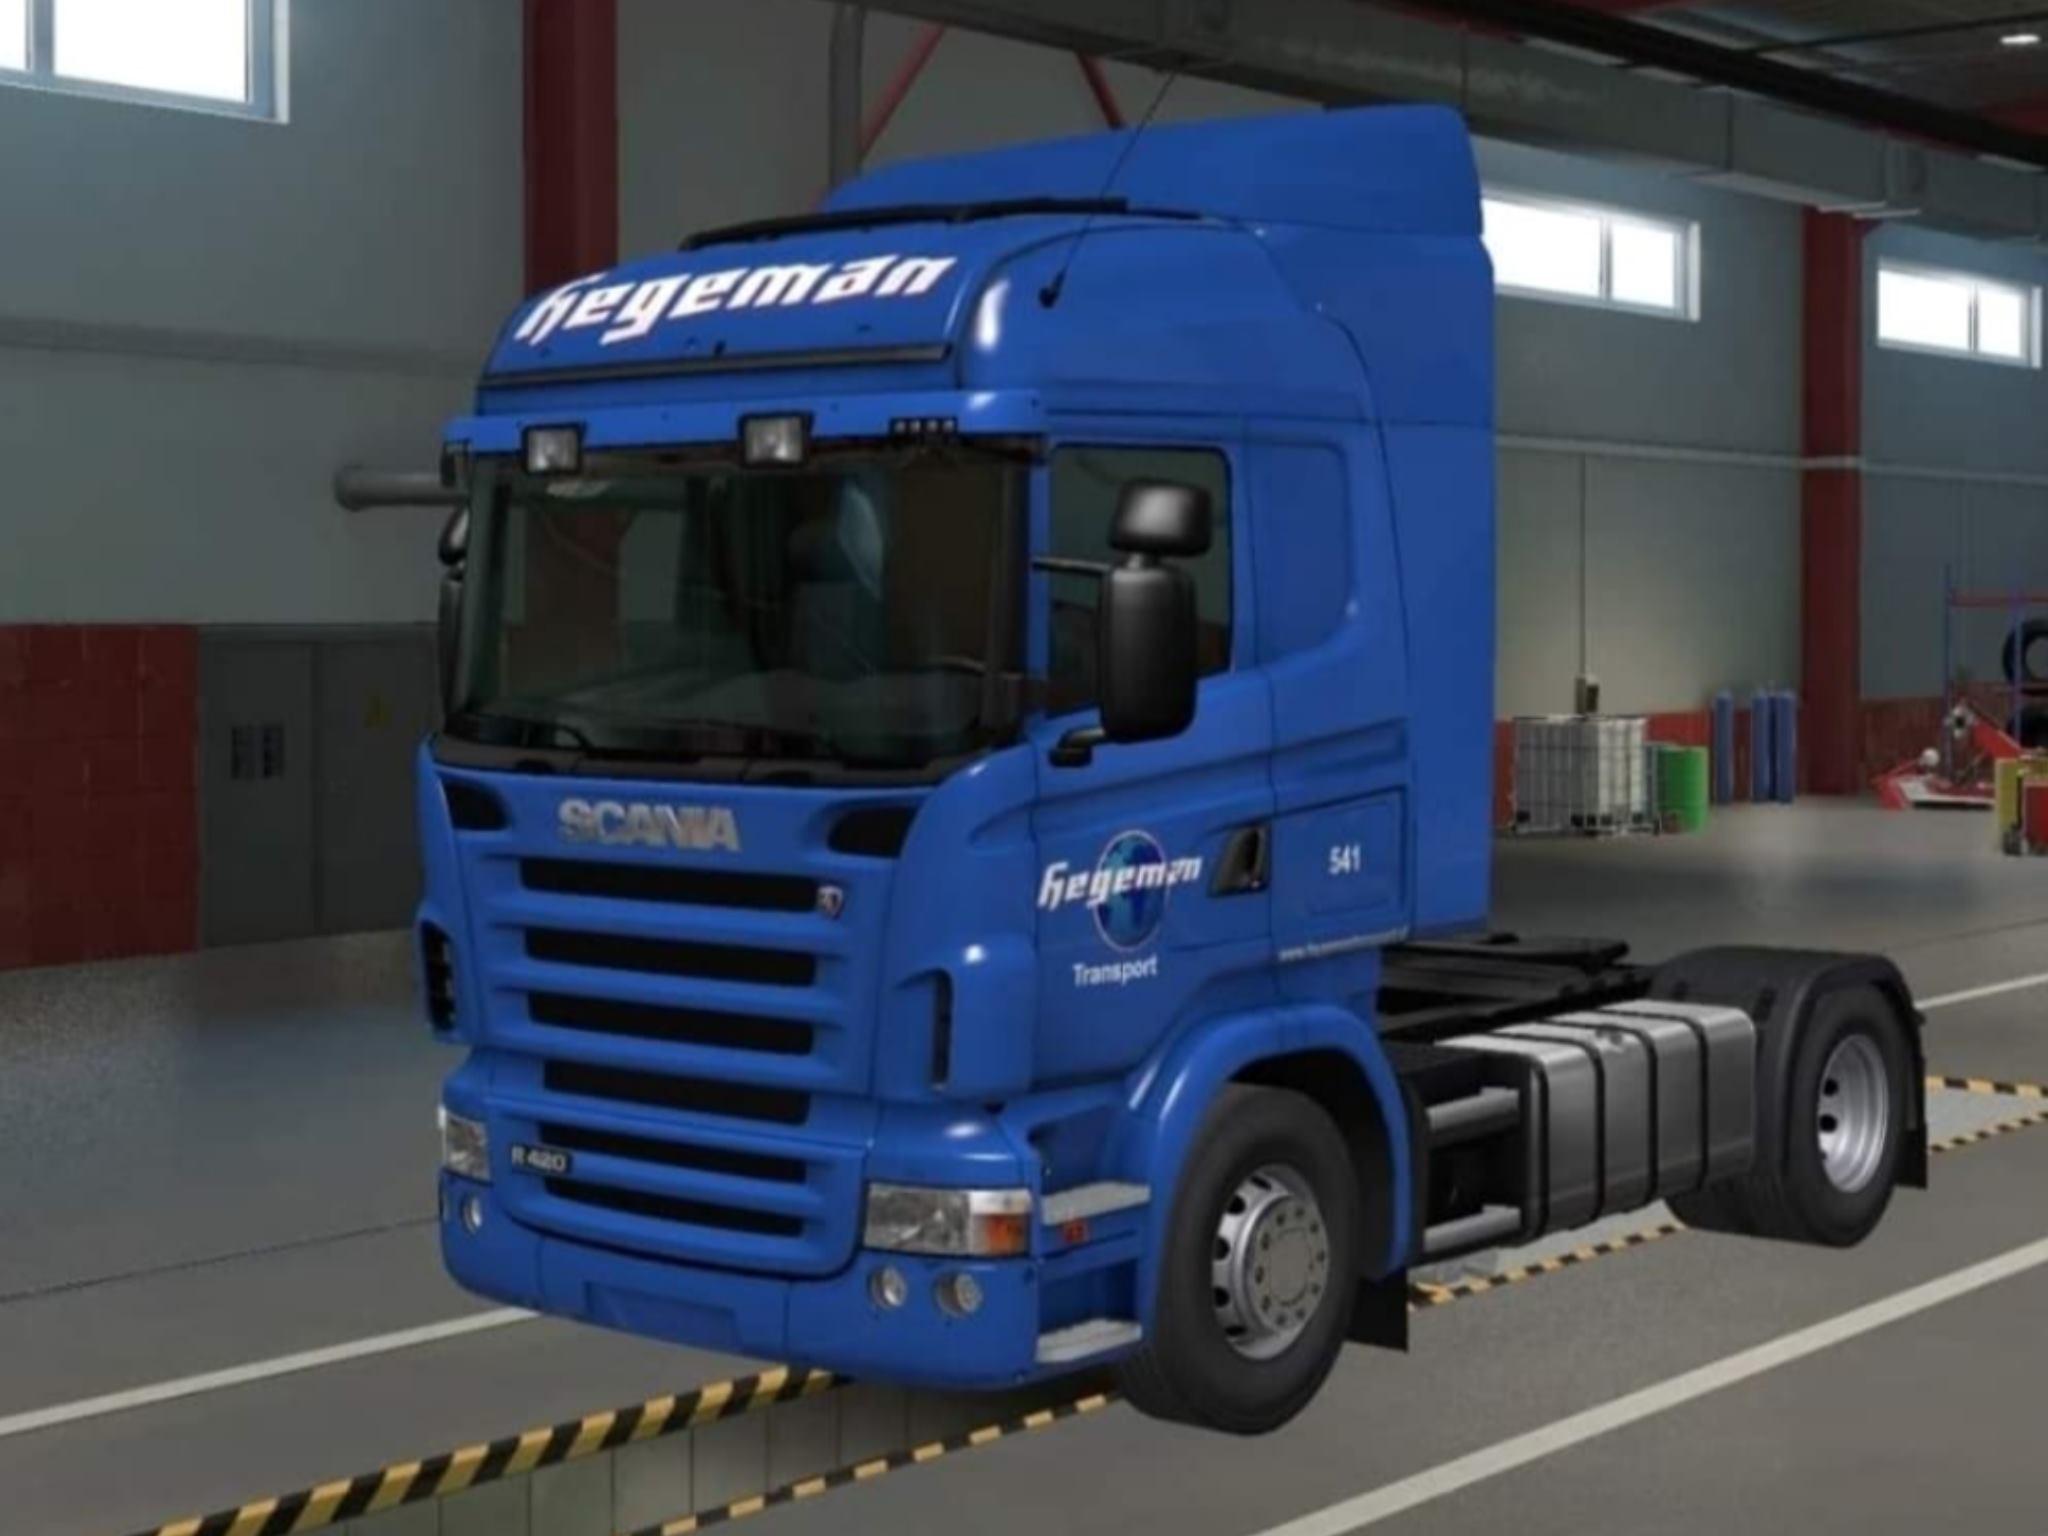 NR-541-Scania--In-de-werkplaats-van-Floris-Rodermond